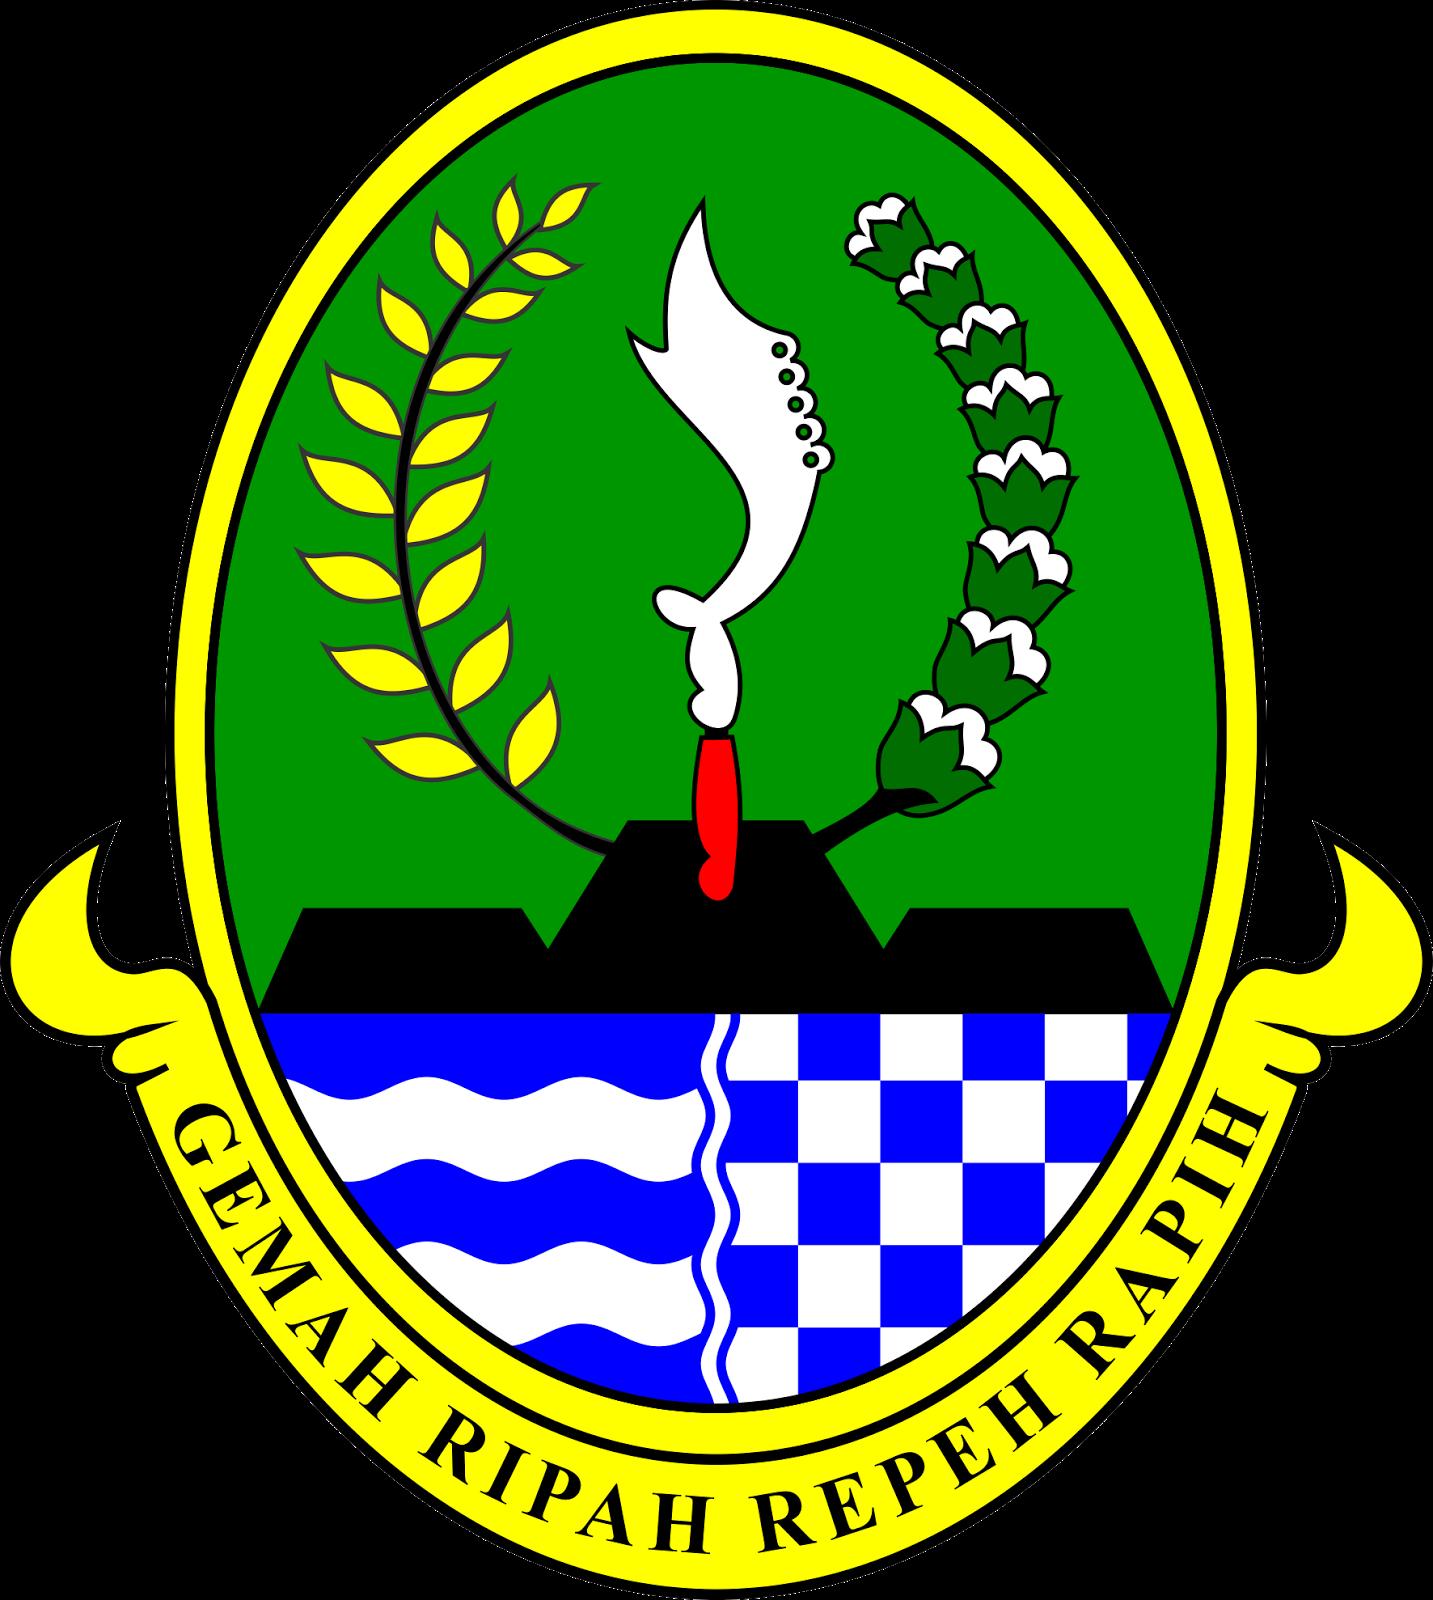 barli berbagi logo provinsi jawa barat png